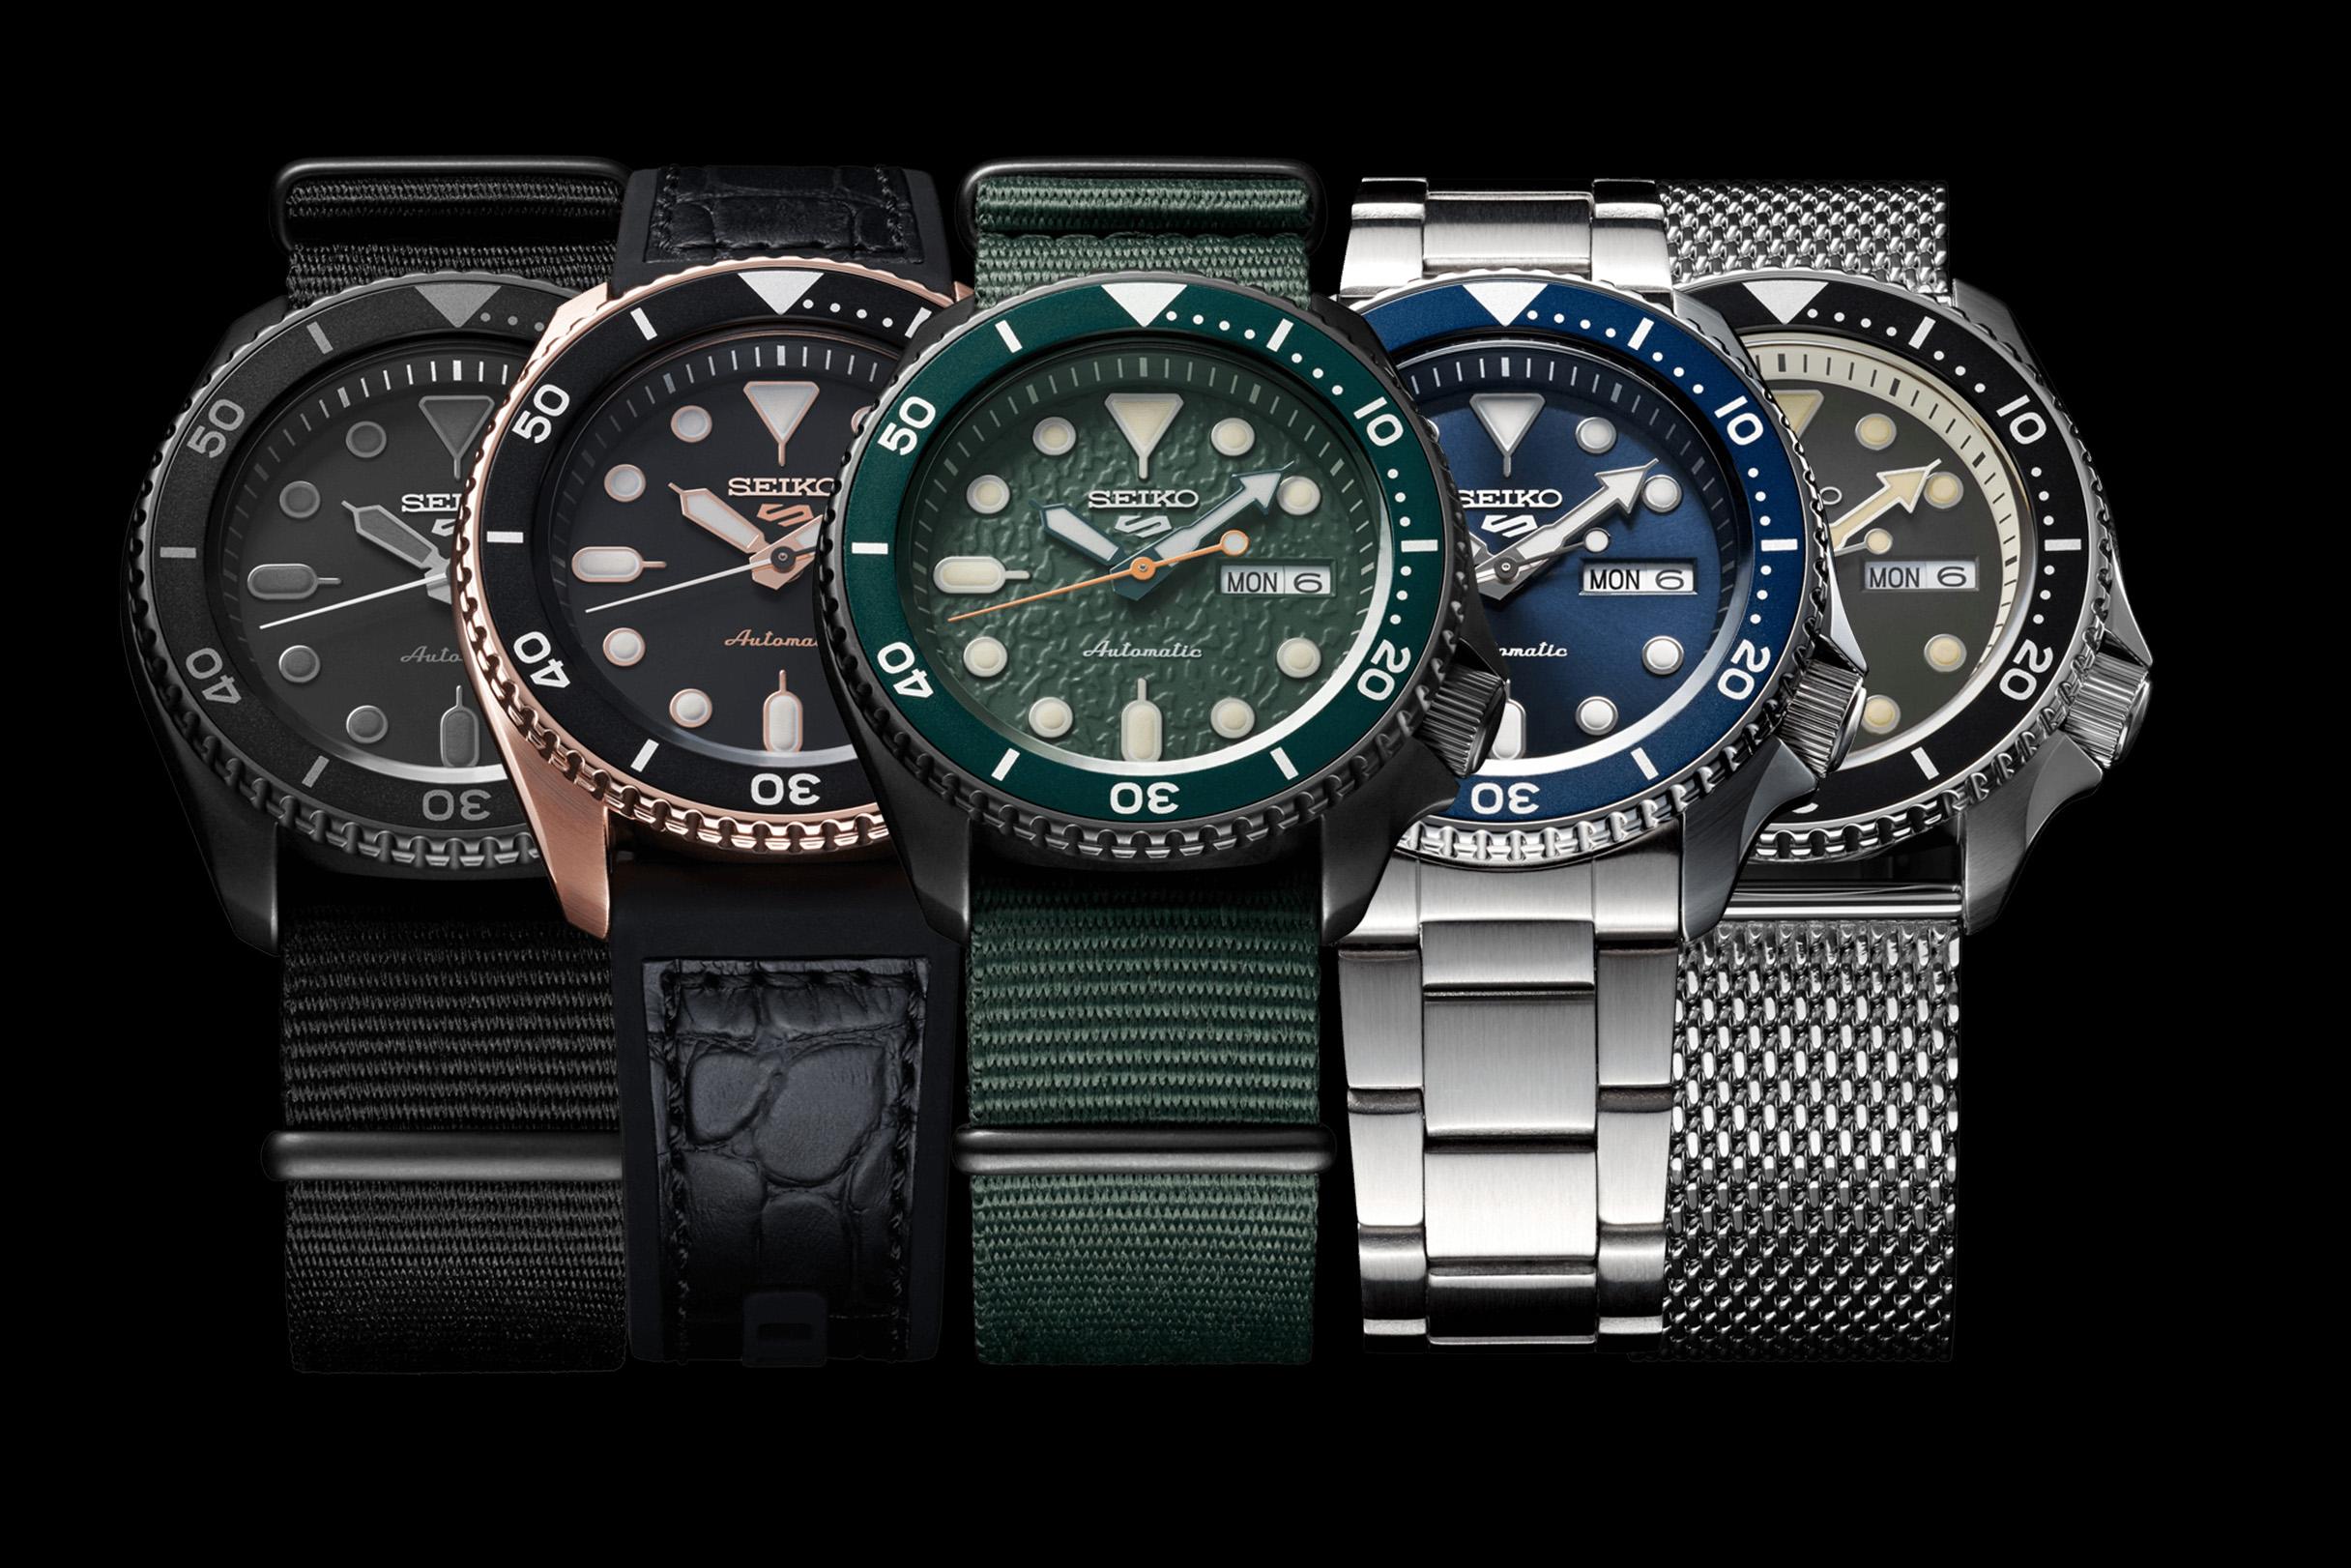 Higher Caliber Seiko Watches Relaunches The Seiko 5 Sports